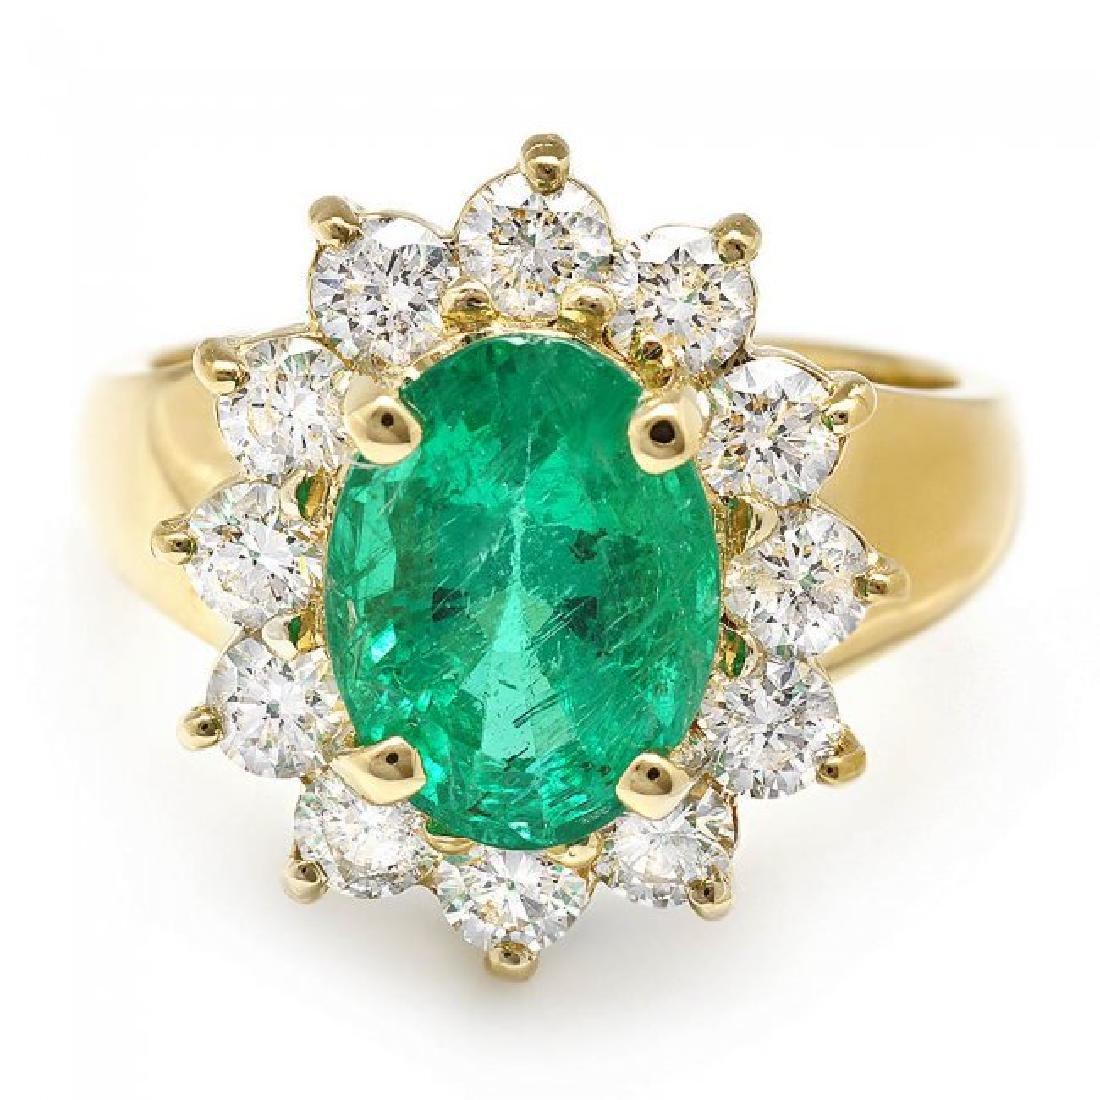 14k Gold 2.70ct Emerald 1.30ct Diamond Ring - 2